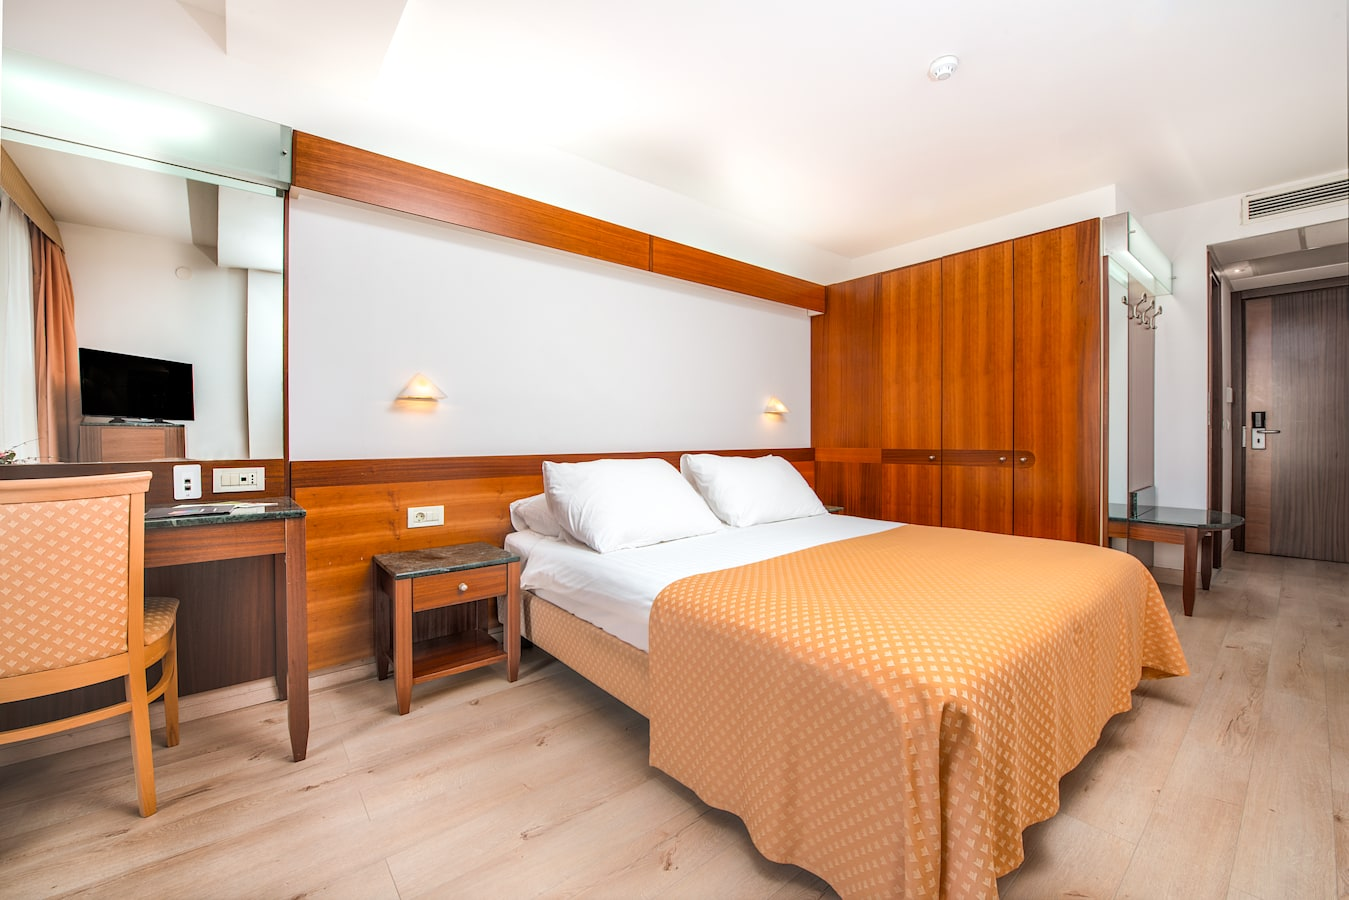 uvala-hotel-dubrovnik-double-room-bedroom.jpg